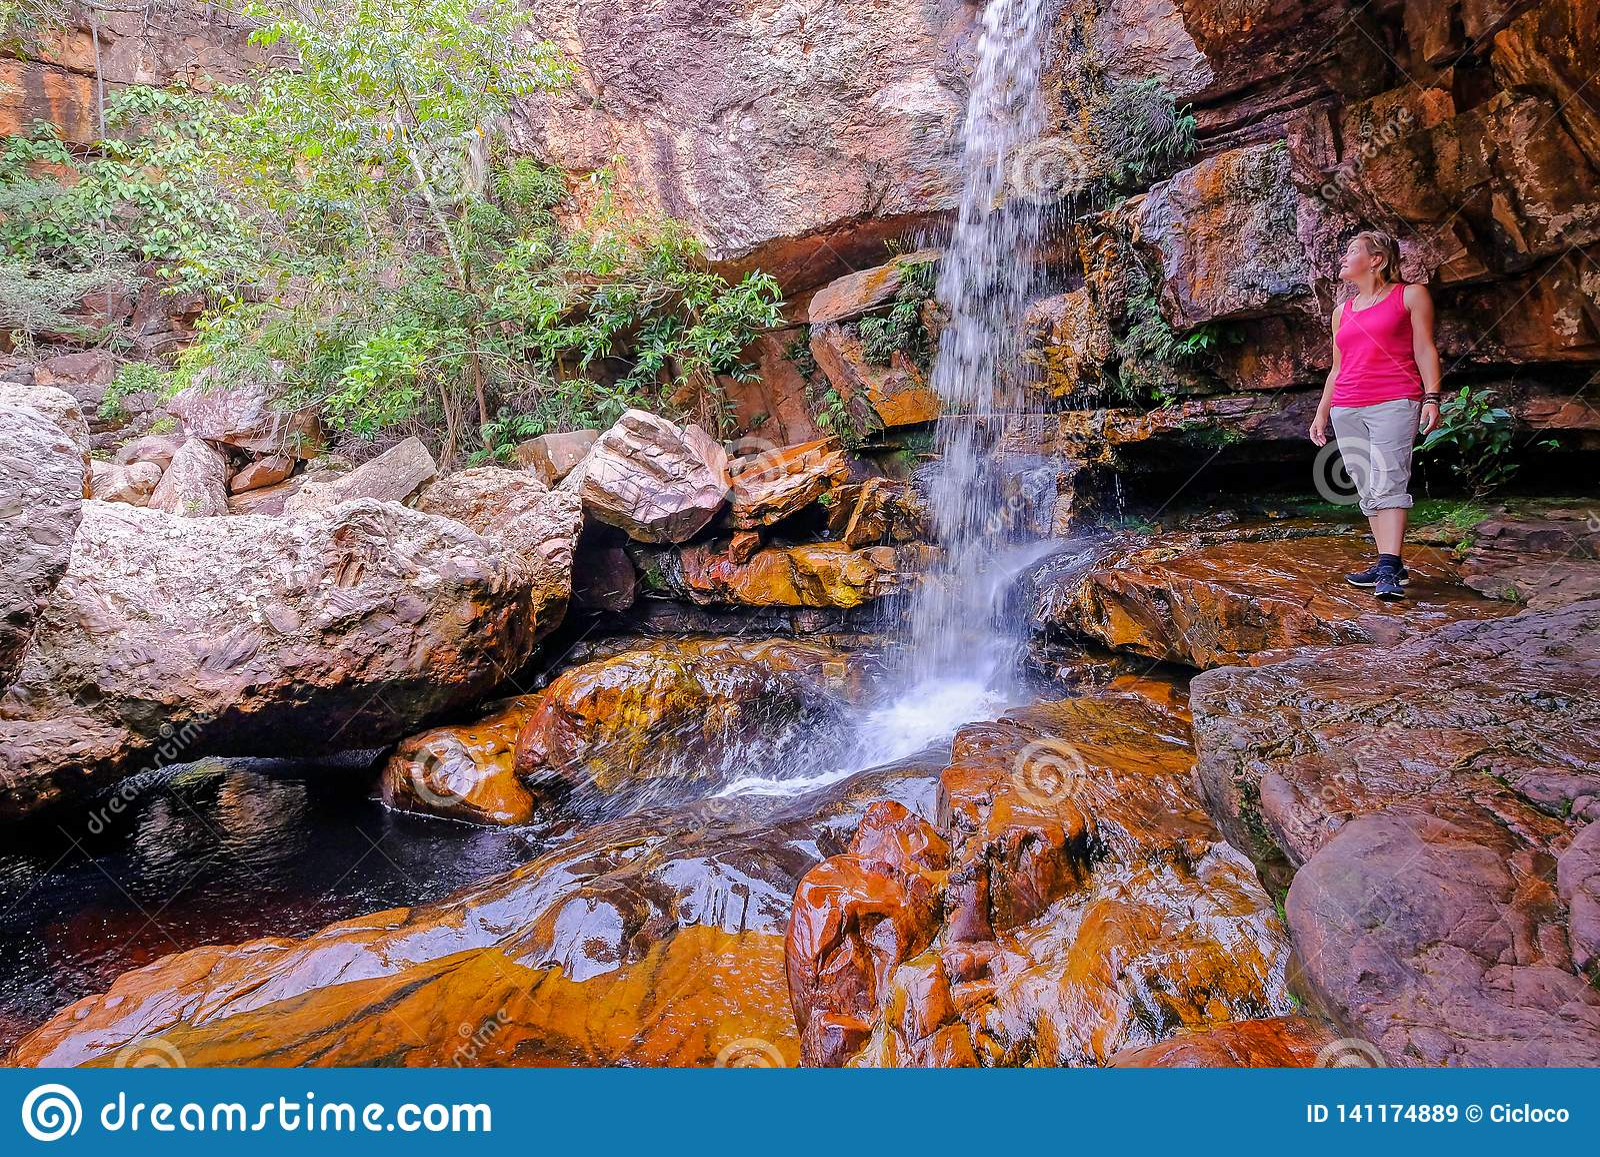 Woman hiker at Cachoeira Da Primavera, Spring Waterfall, Rio Lencois river, Chapada Diamantina National Park, Brazil